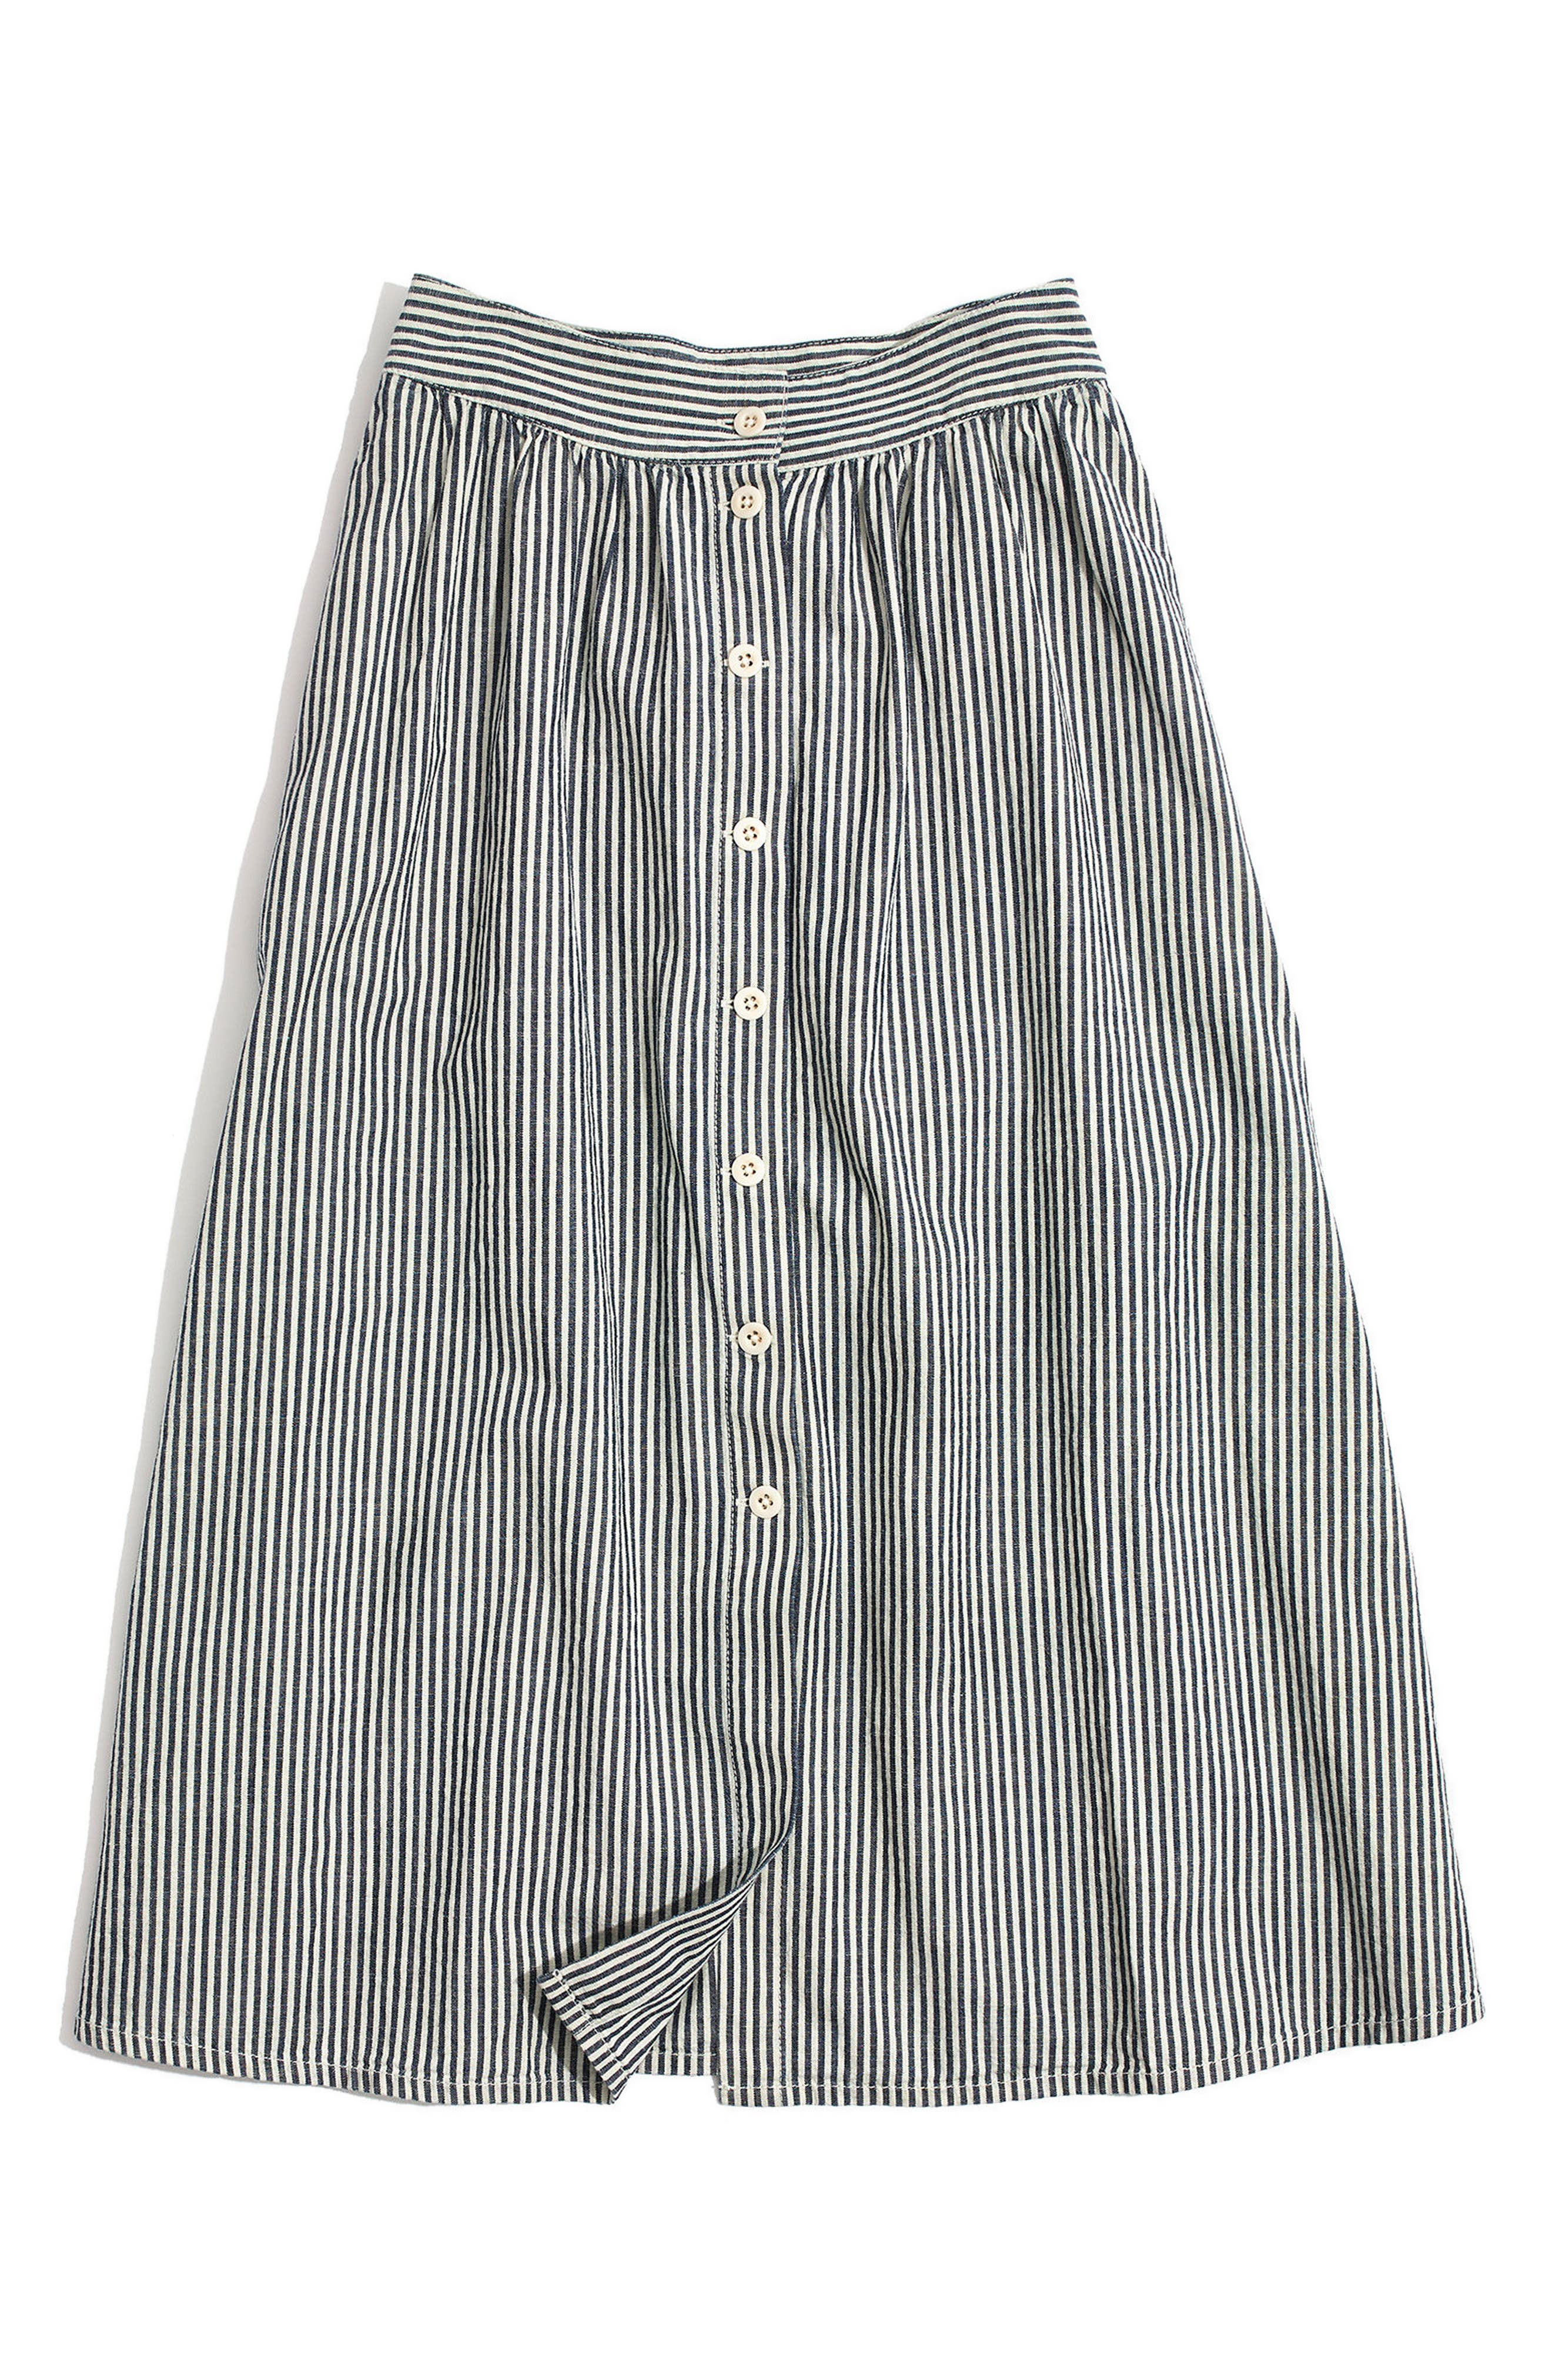 Palisade Chambray Stripe Button Front Midi Skirt,                             Alternate thumbnail 3, color,